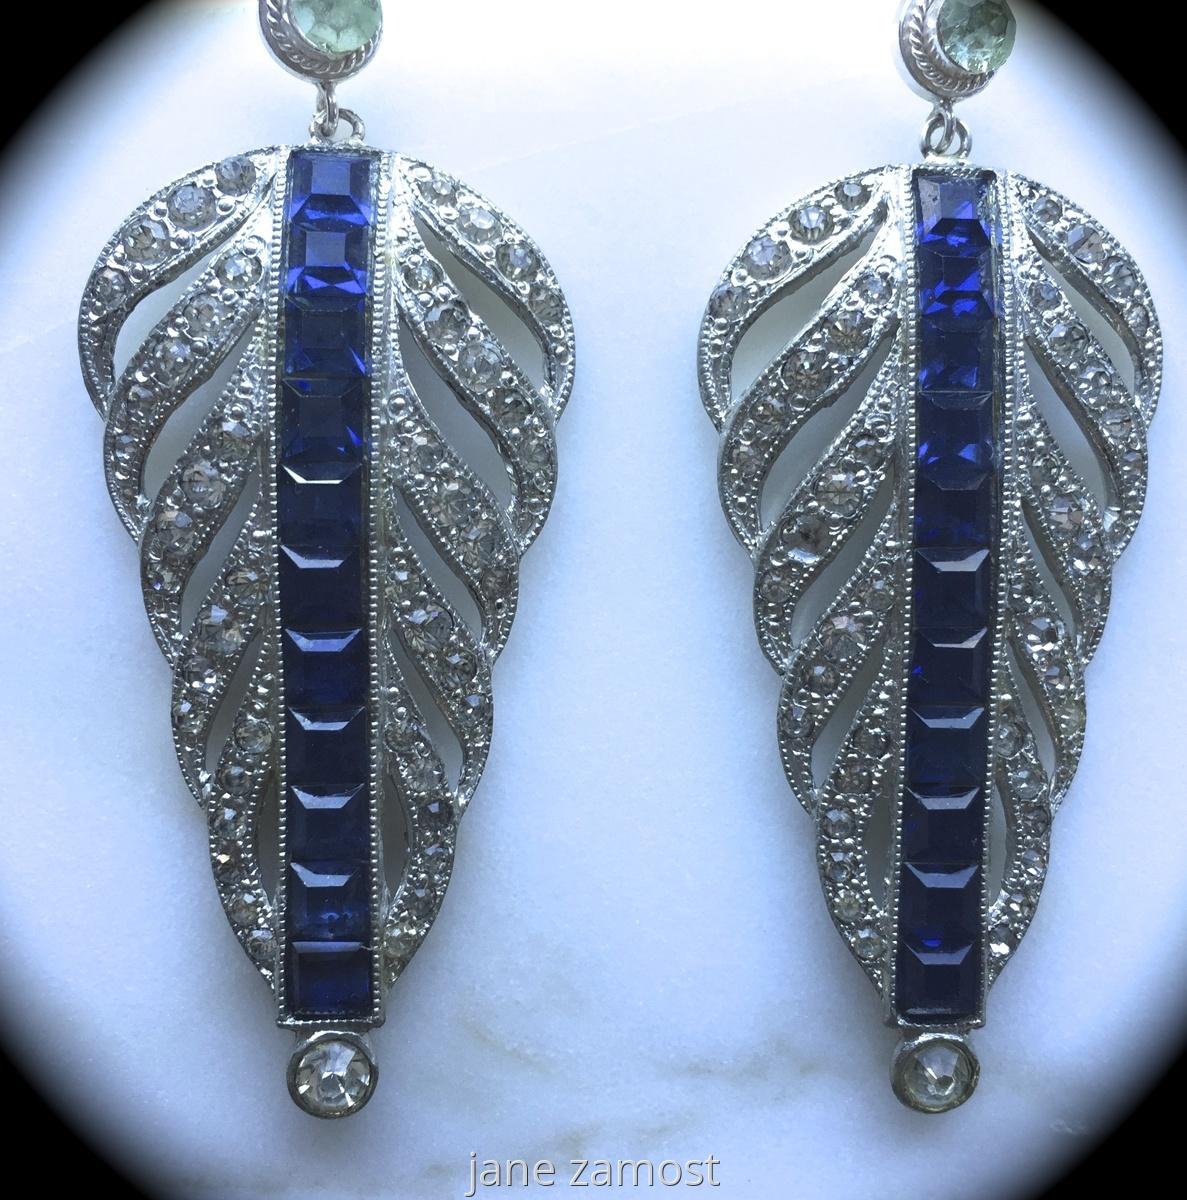 Vintage and Swarovski Earrings. VIN018 (large view)